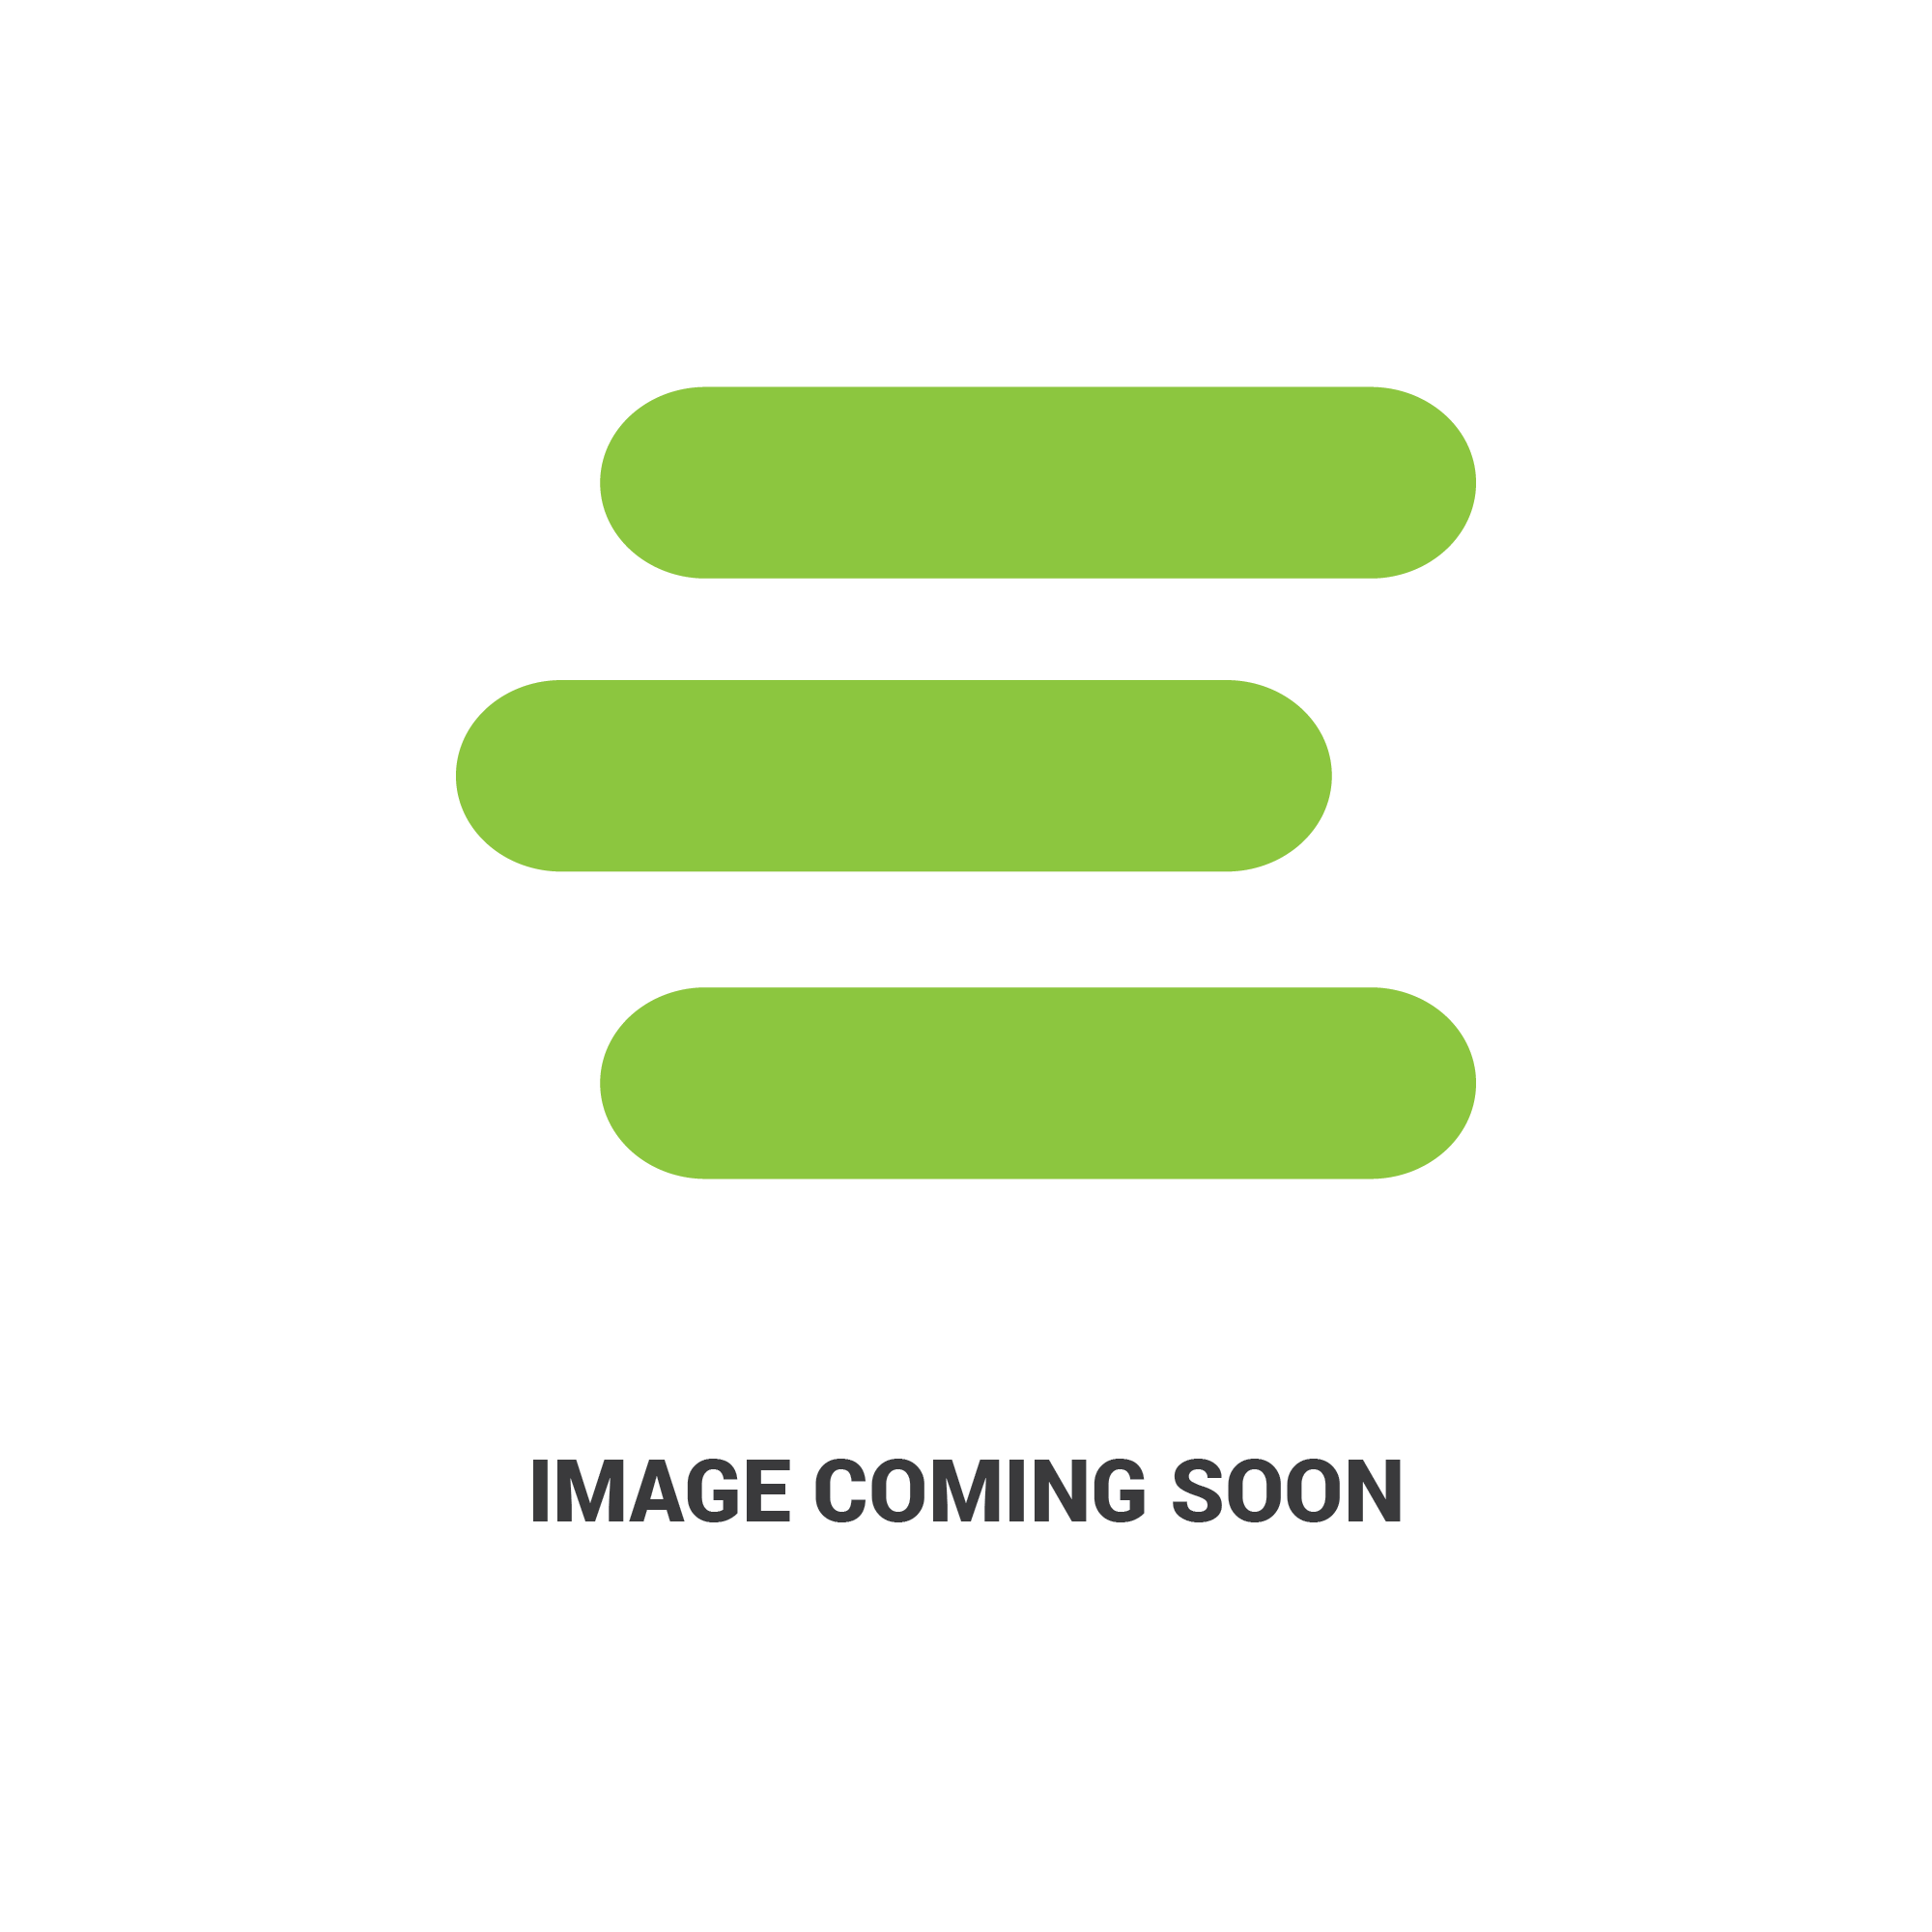 E-15241-32093edit 228.jpg